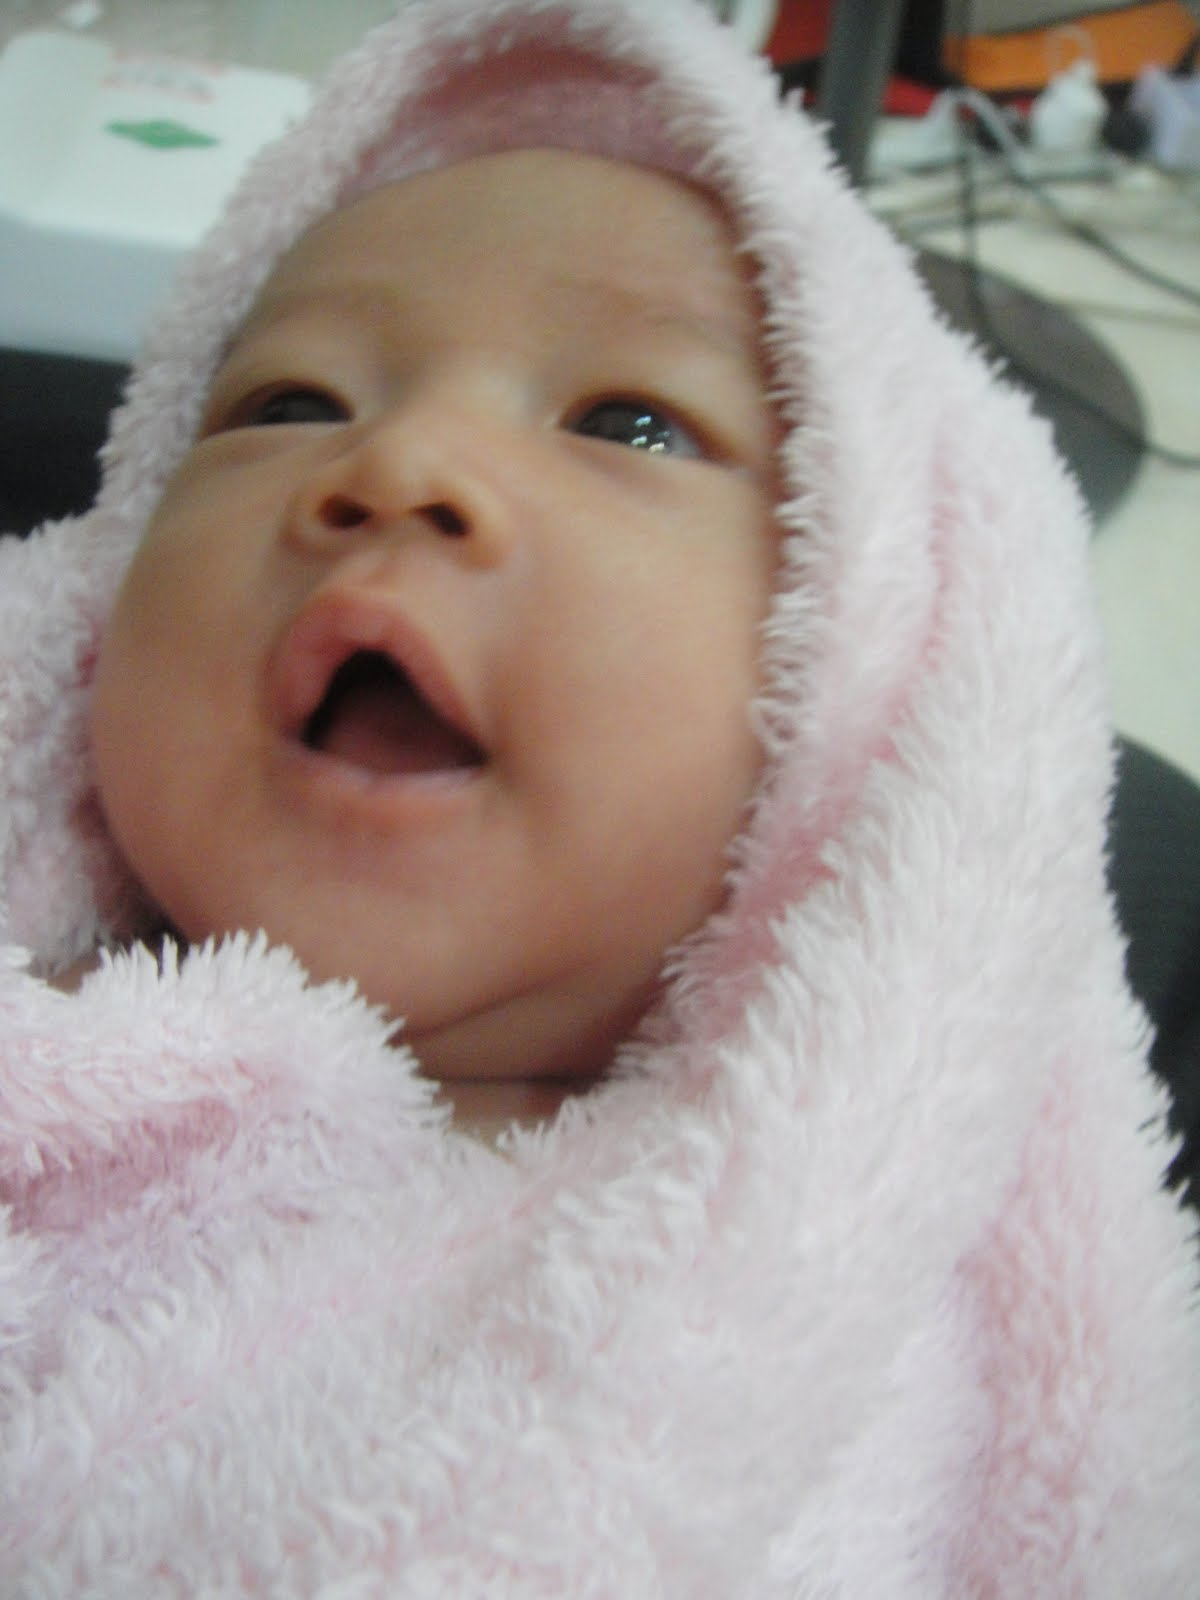 #The Beauty In Everyday Life#: Cara-cara merangsang Bayi ...